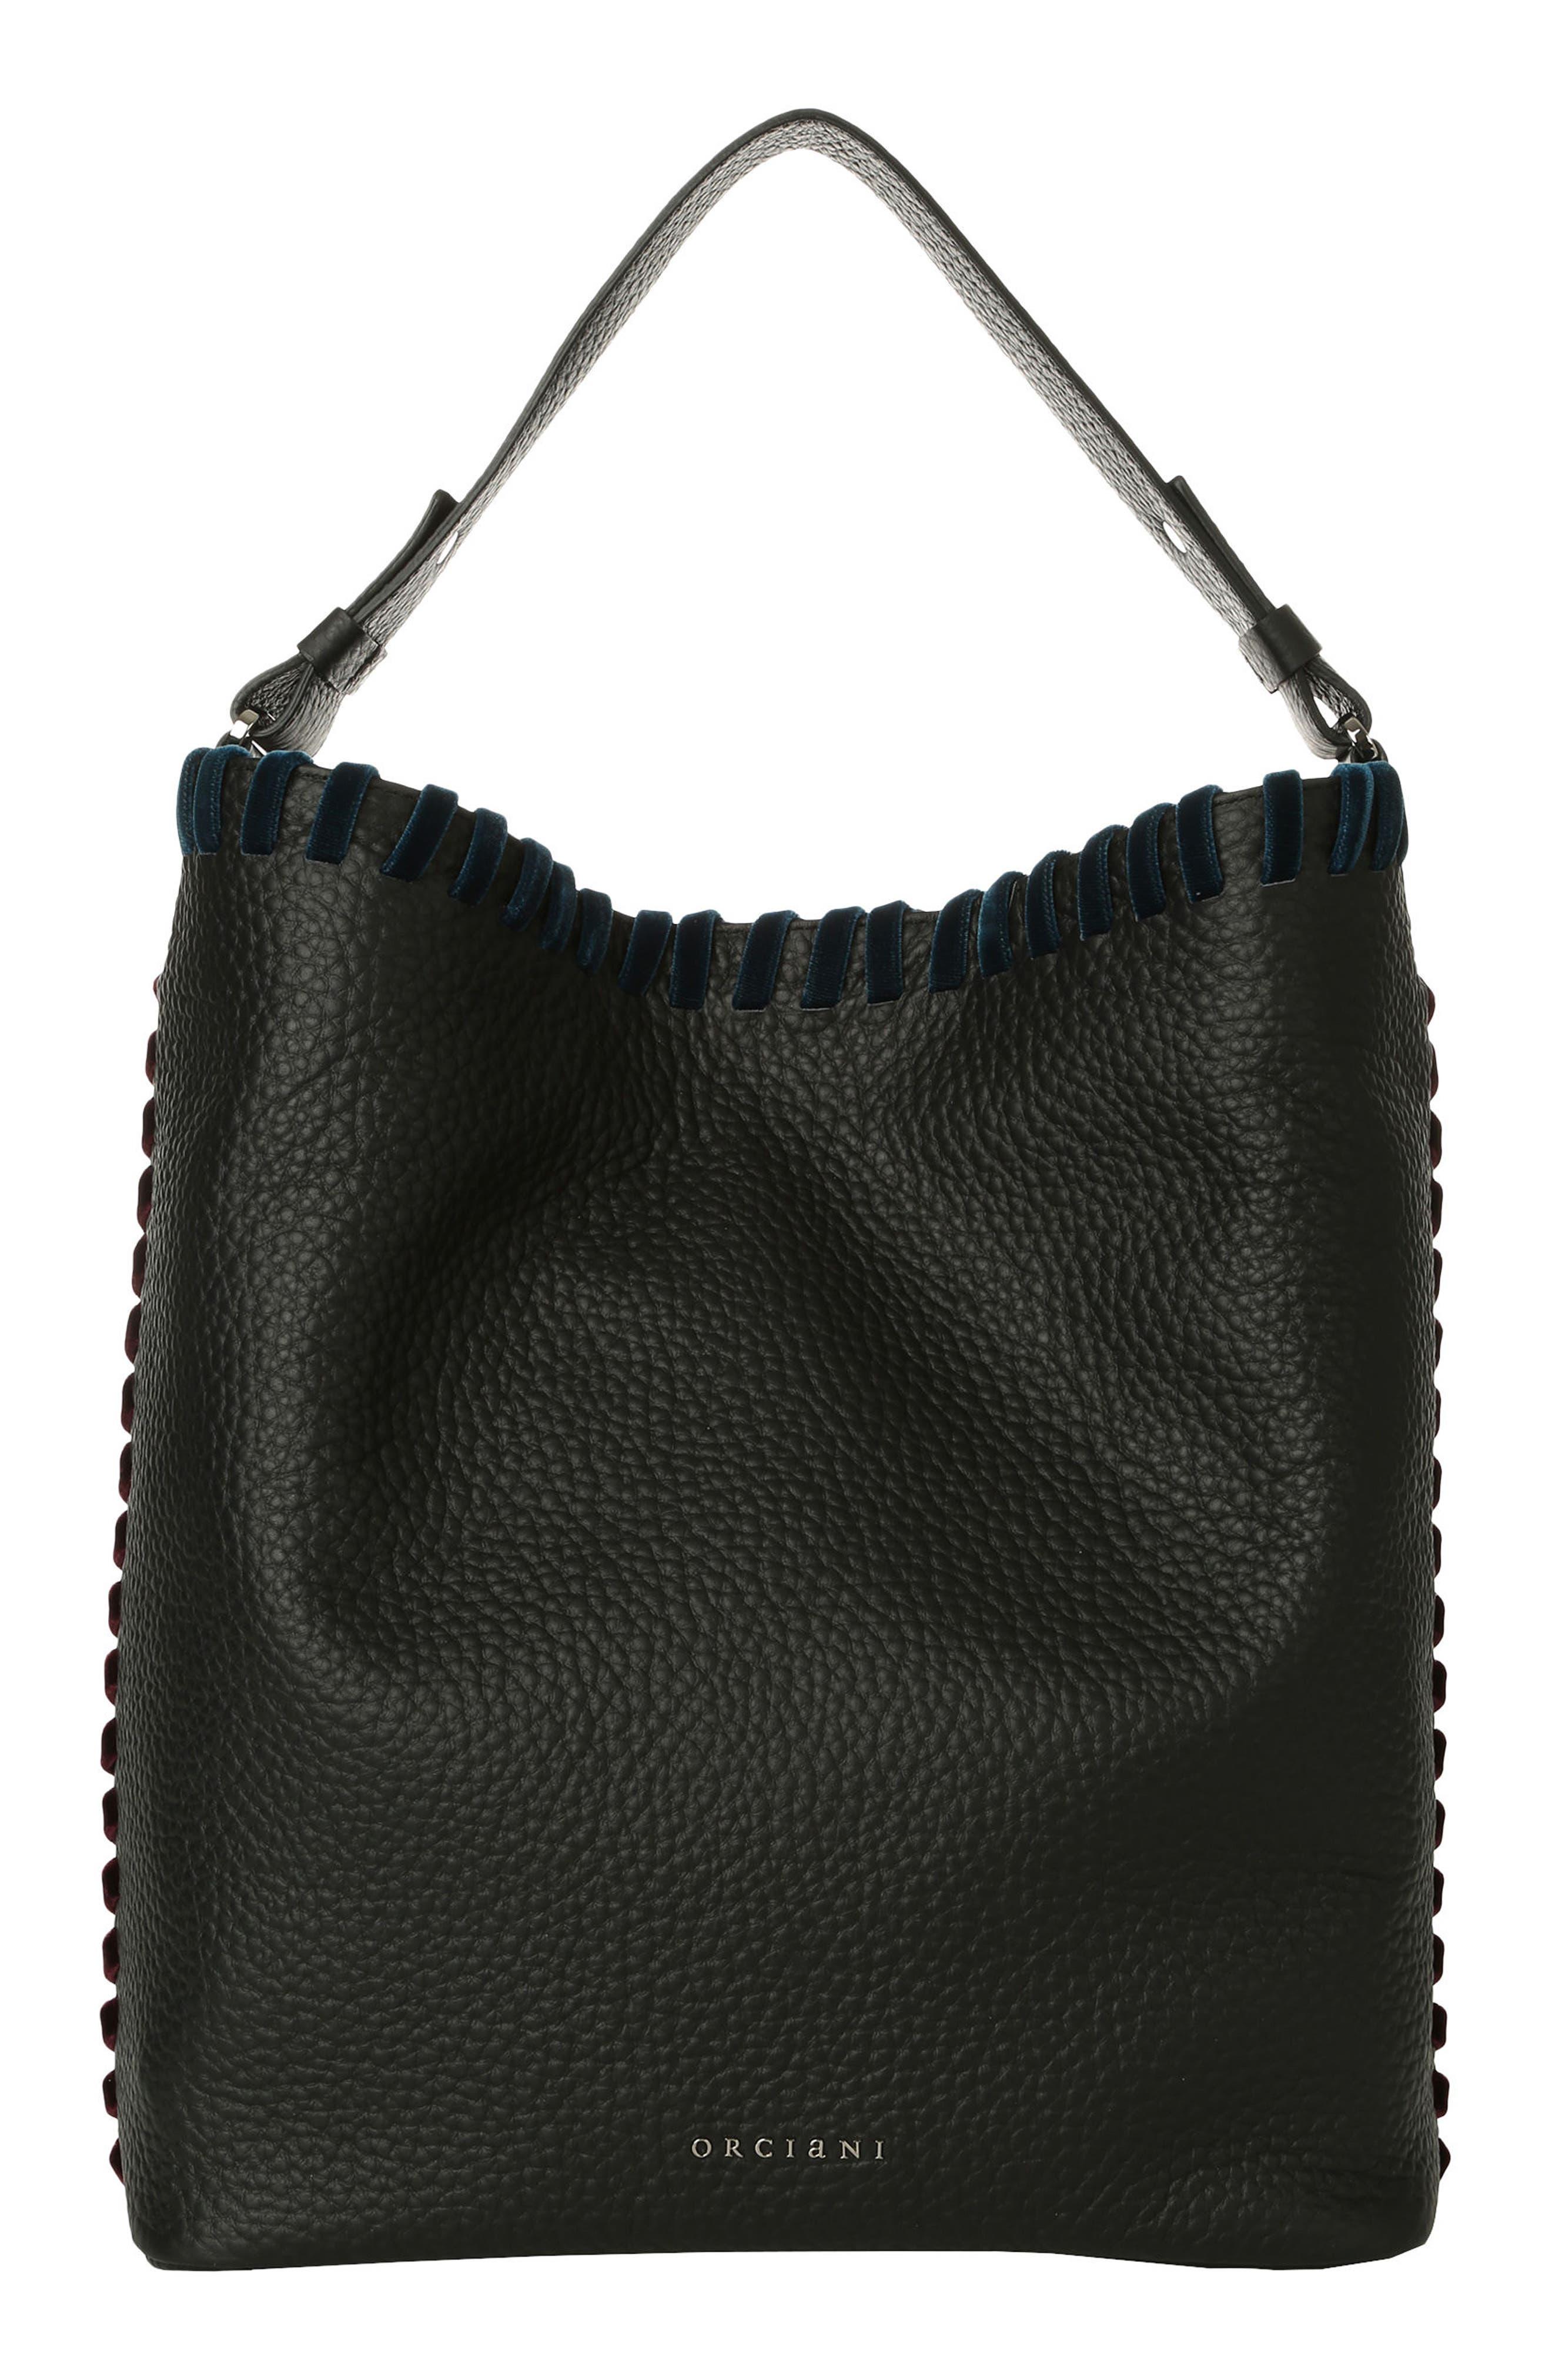 Noona Velvet Trim Calfskin Leather Tote,                             Main thumbnail 1, color,                             001